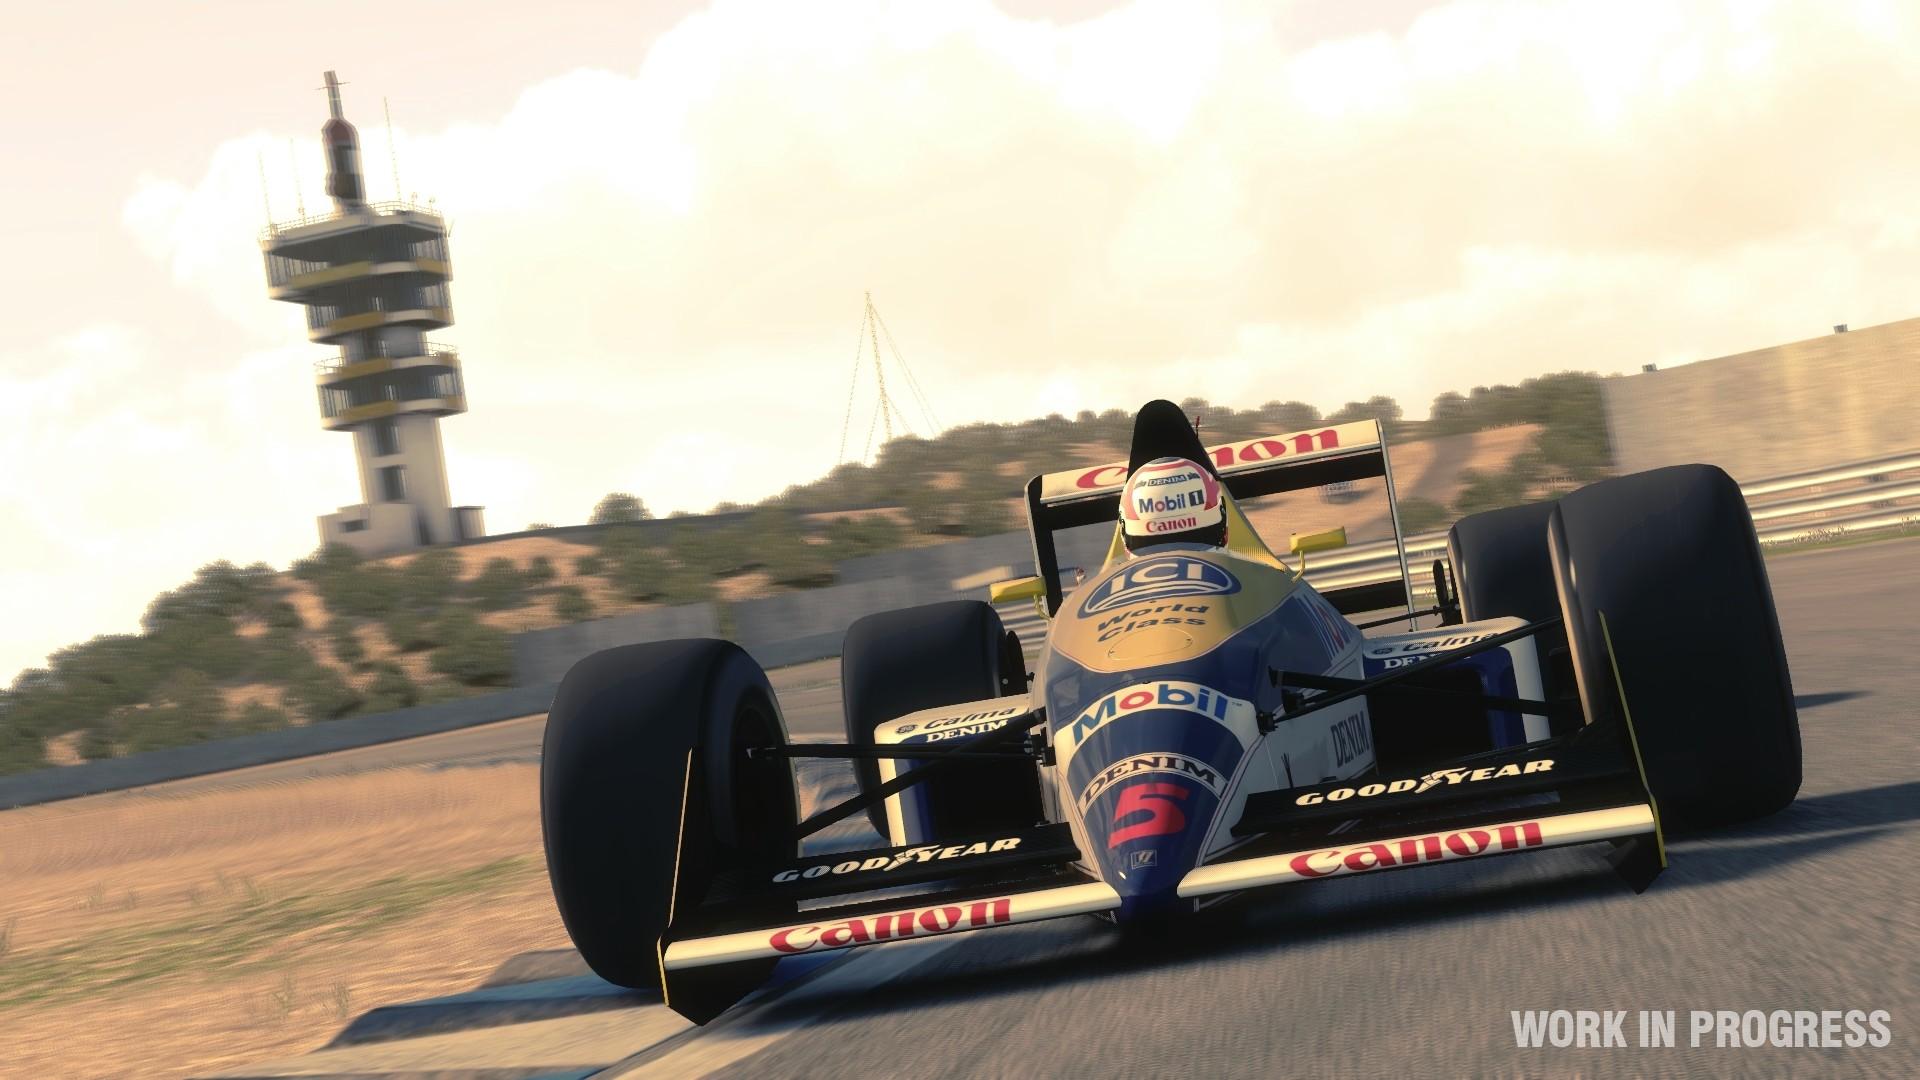 F1 2013 : Prends garde Vettel, me voilà !